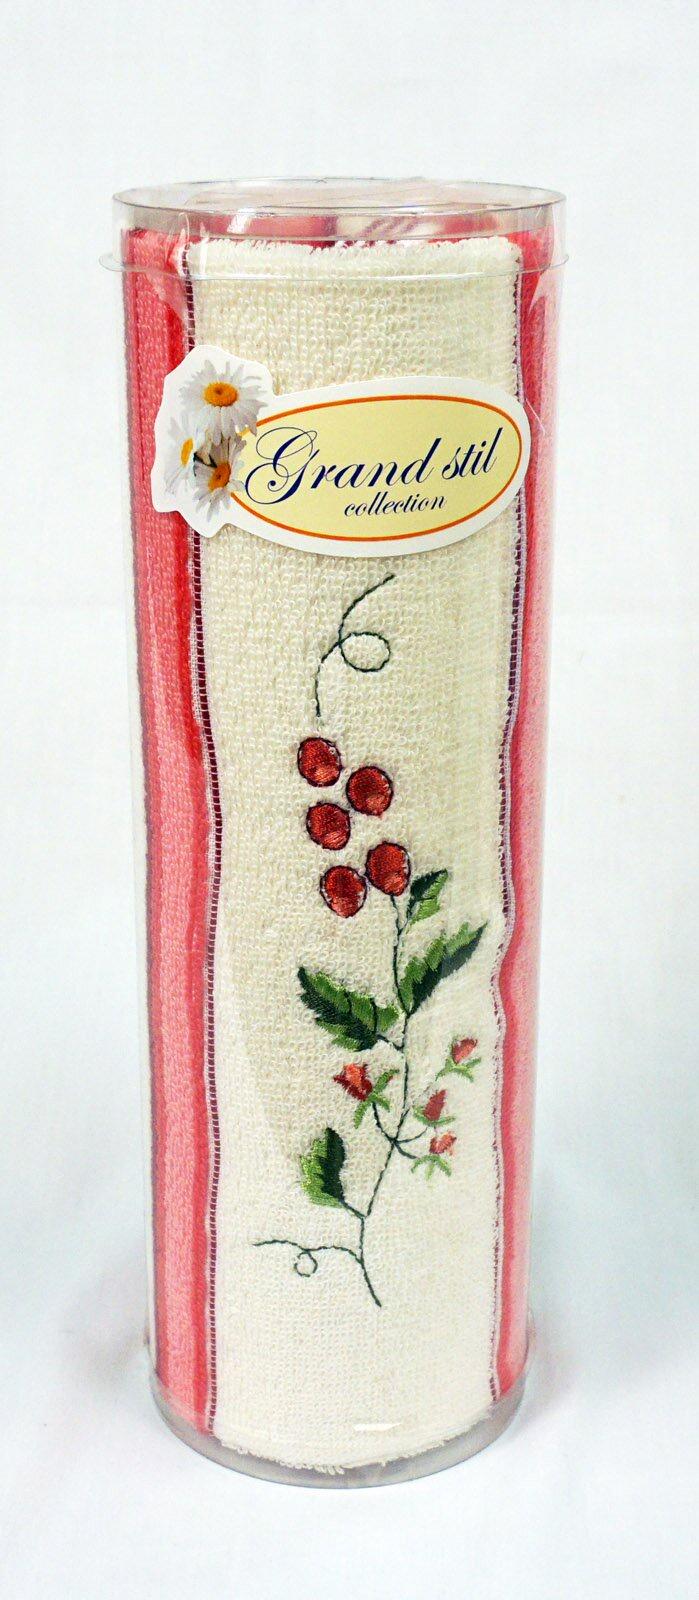 Полотенце для лица, рук или ног Grand Stil Витаминка с вышивкой , размер 40*70, 11-93t, розовый Grand Stil